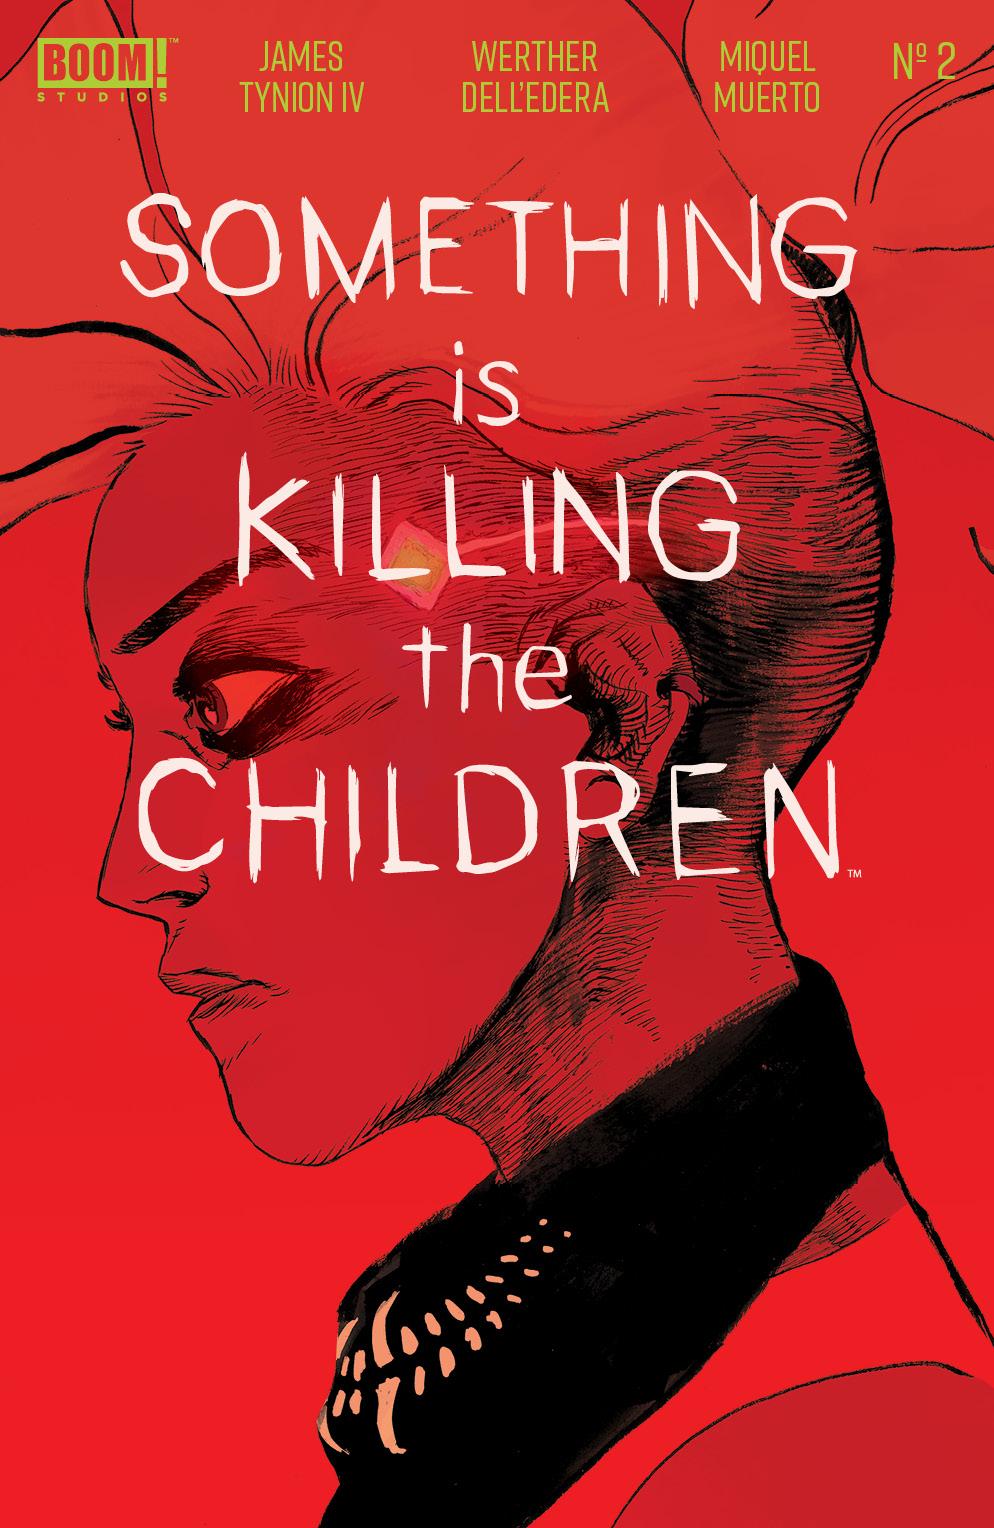 Something Is Killing The Children #2 Cover, BOOM! Studios.